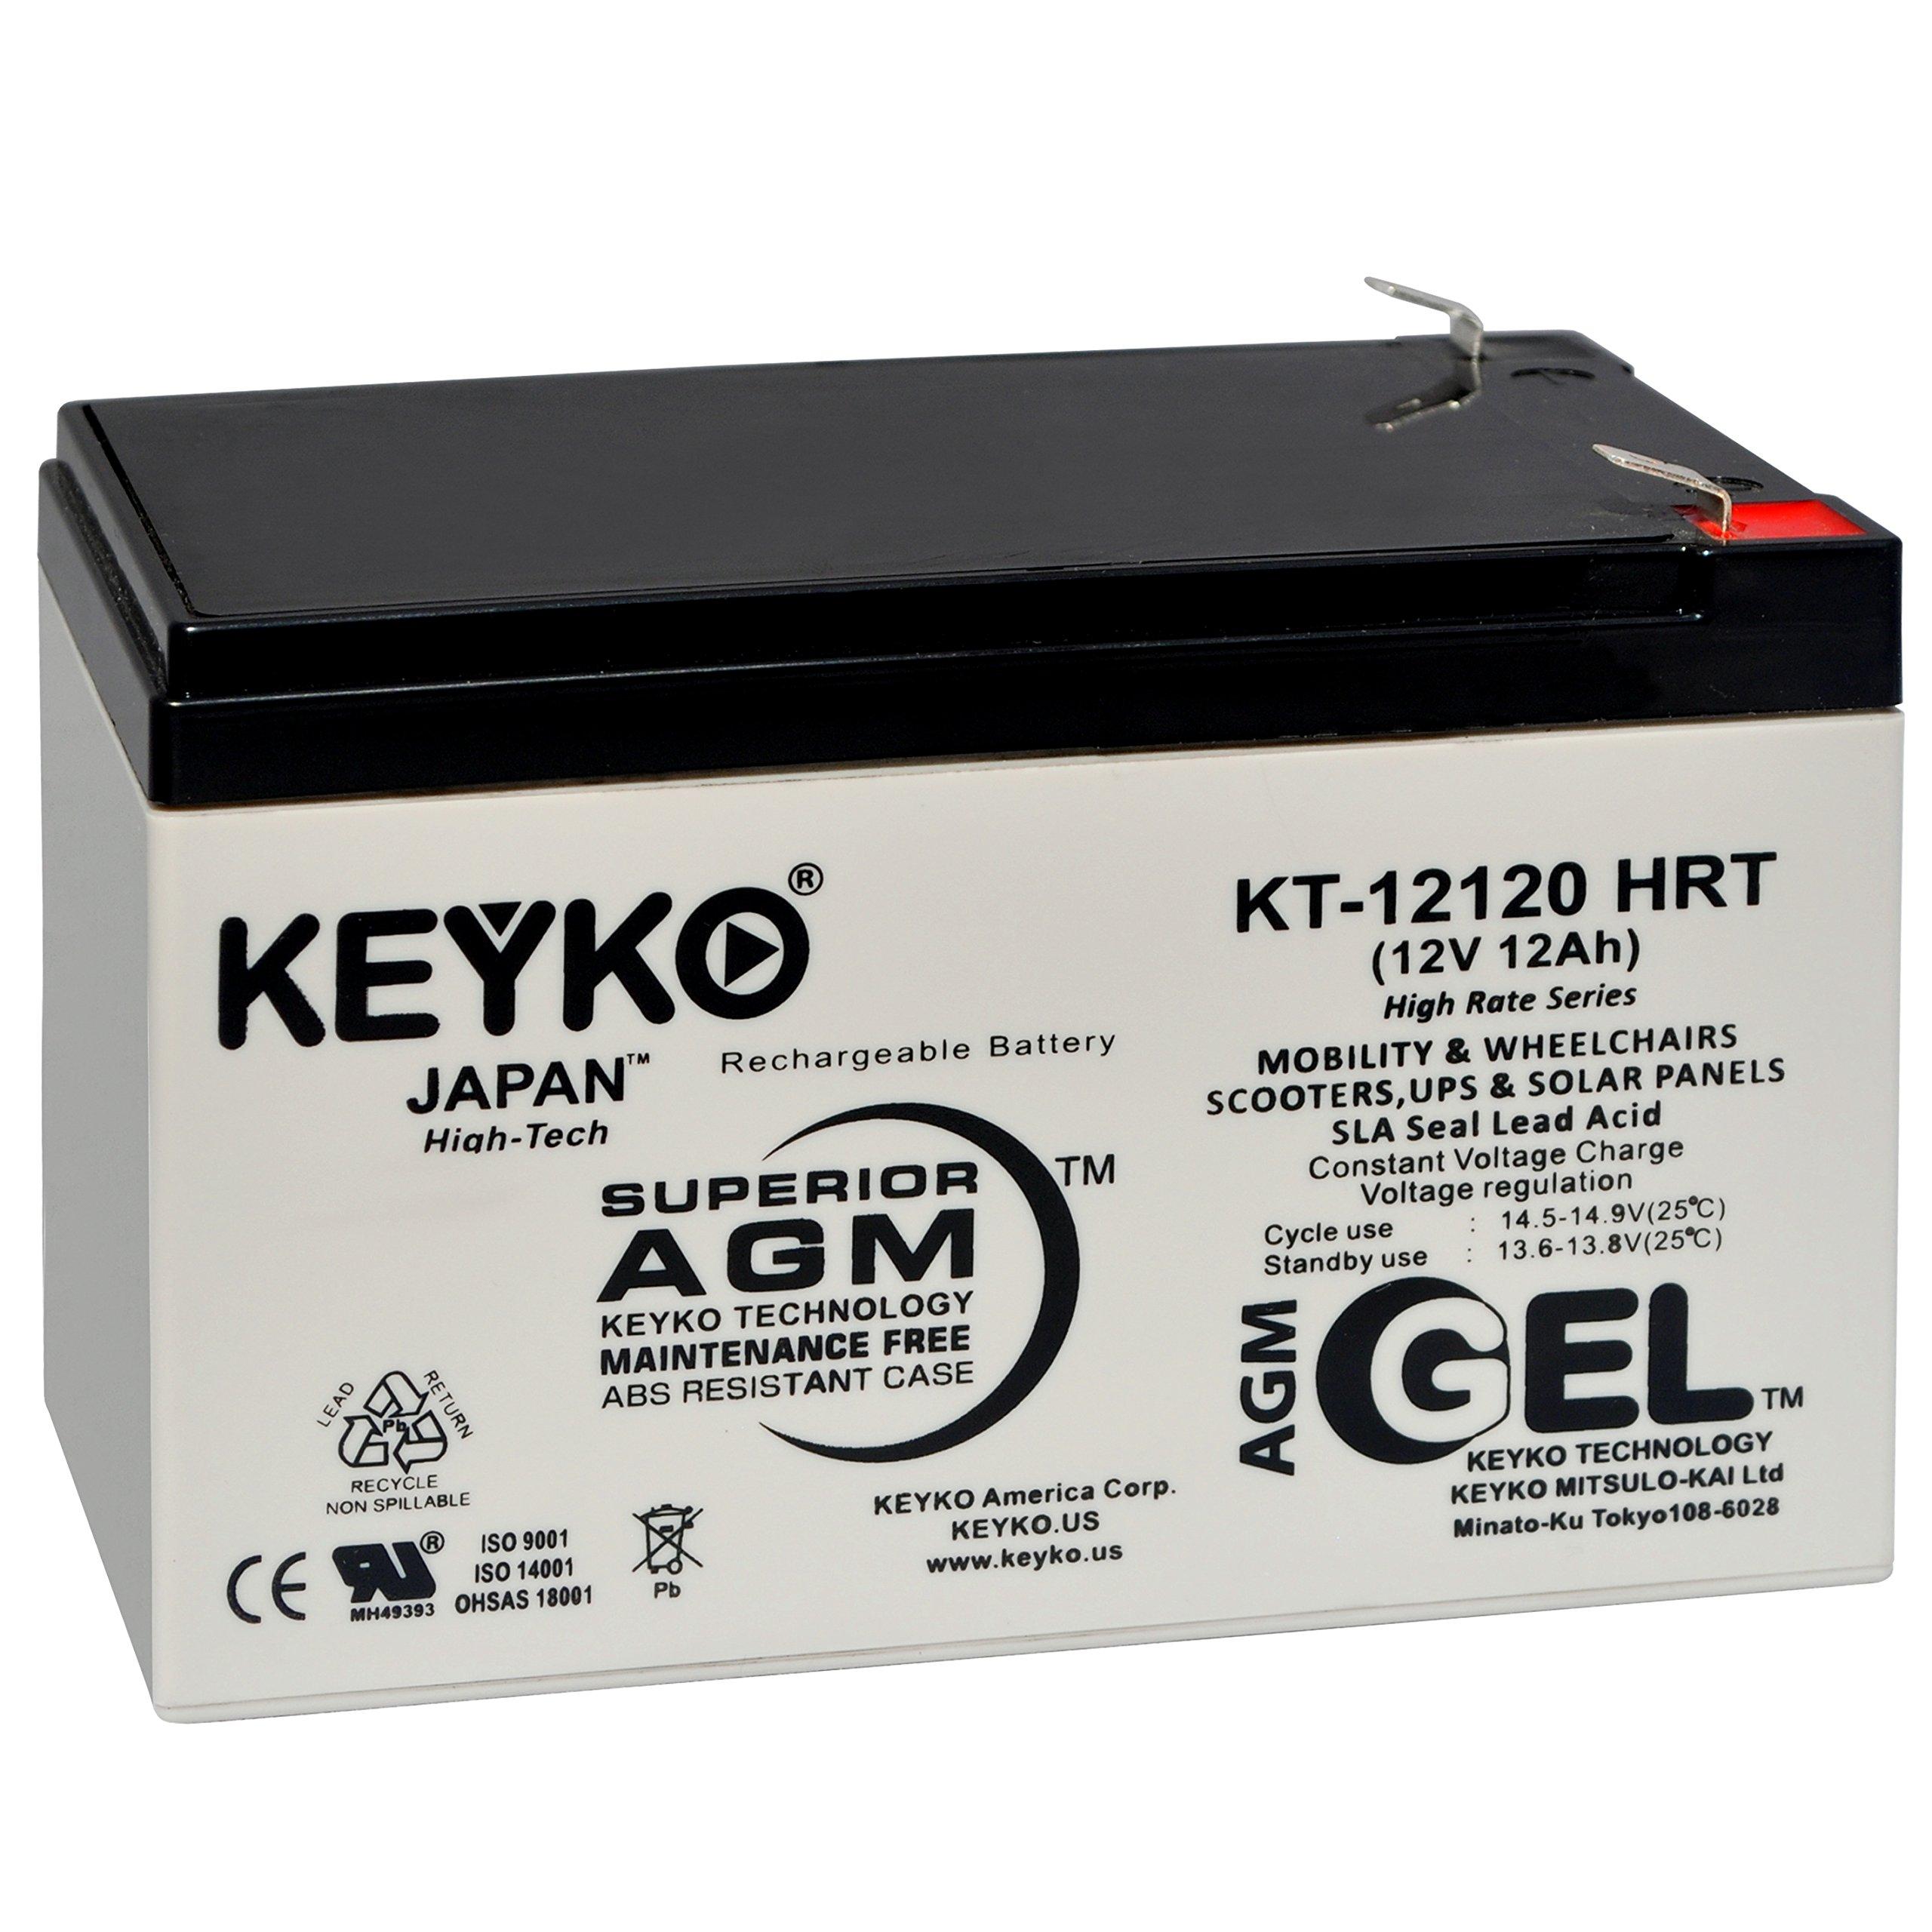 Razor MX500/MX650 Battery Pack W15128190003 12V 12Ah Battery - Fresh & Real 14.0 Amp - Gel Deep Cycle AGM/SLA Designed for Scooters - Genuine KEYKO KT-12120 HRT - F2 by KEYKO